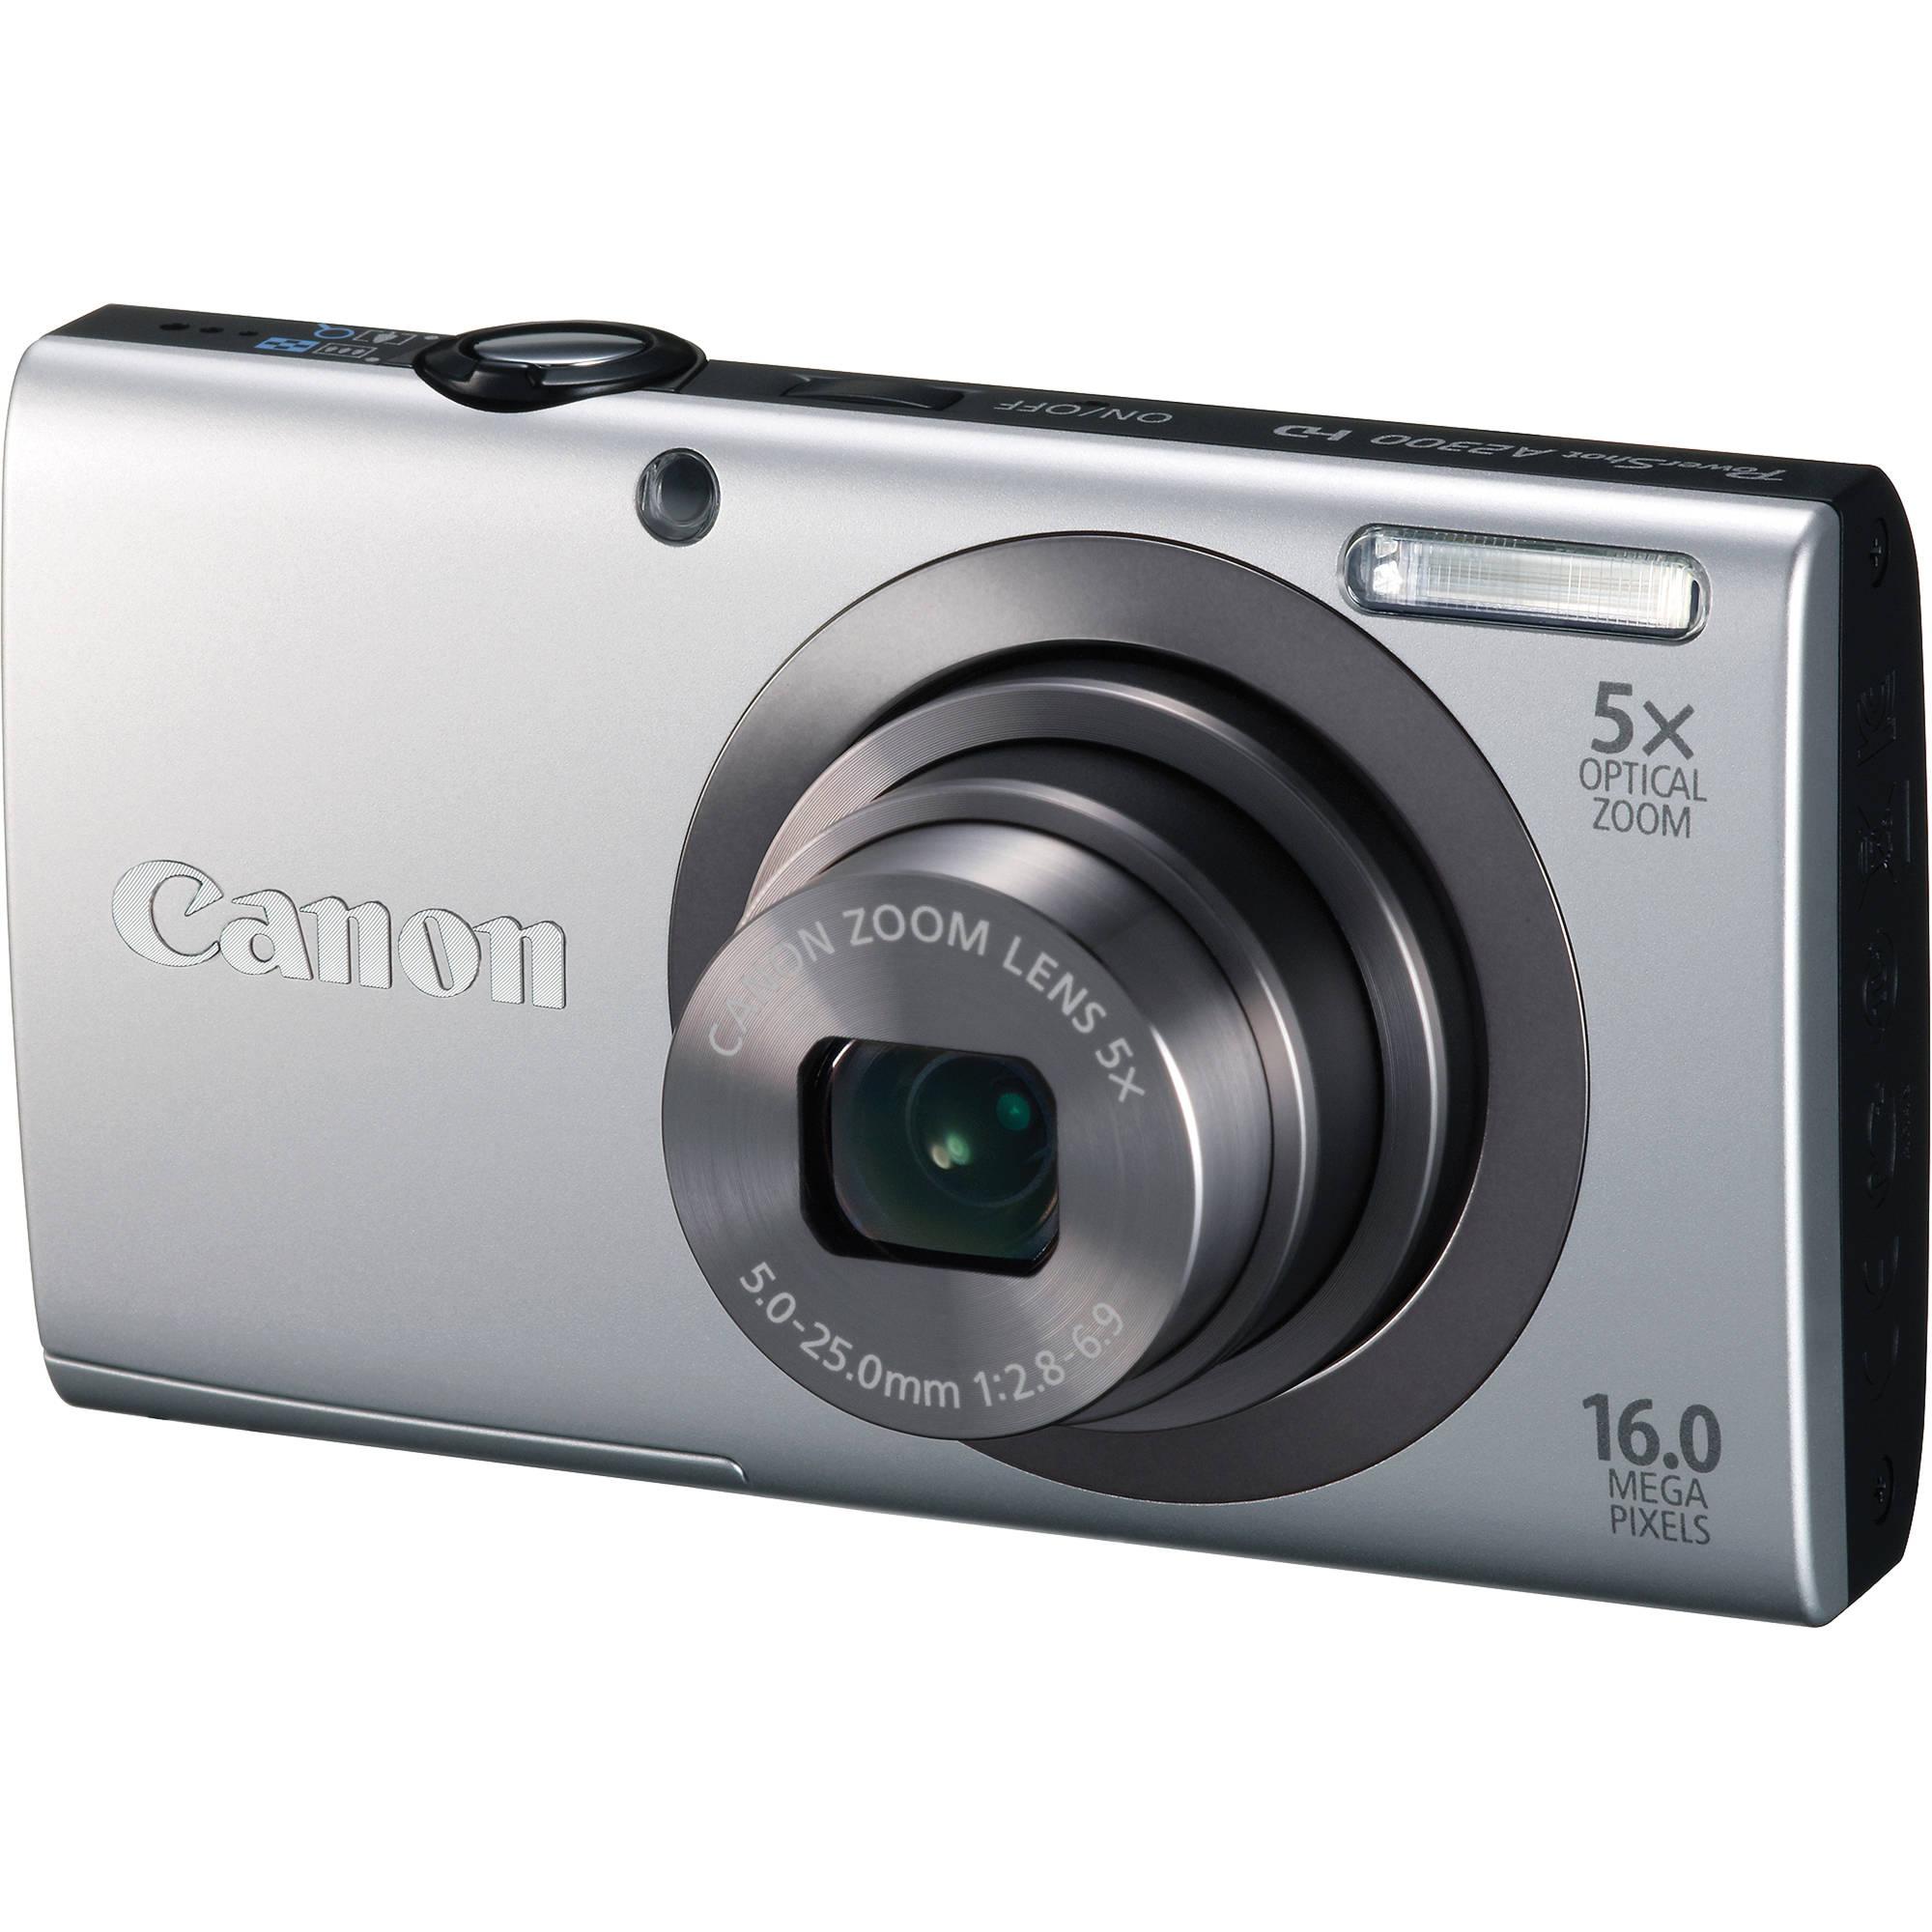 Canon PowerShot A2300 Digital Camera (Silver) 6184B001 B&H ...